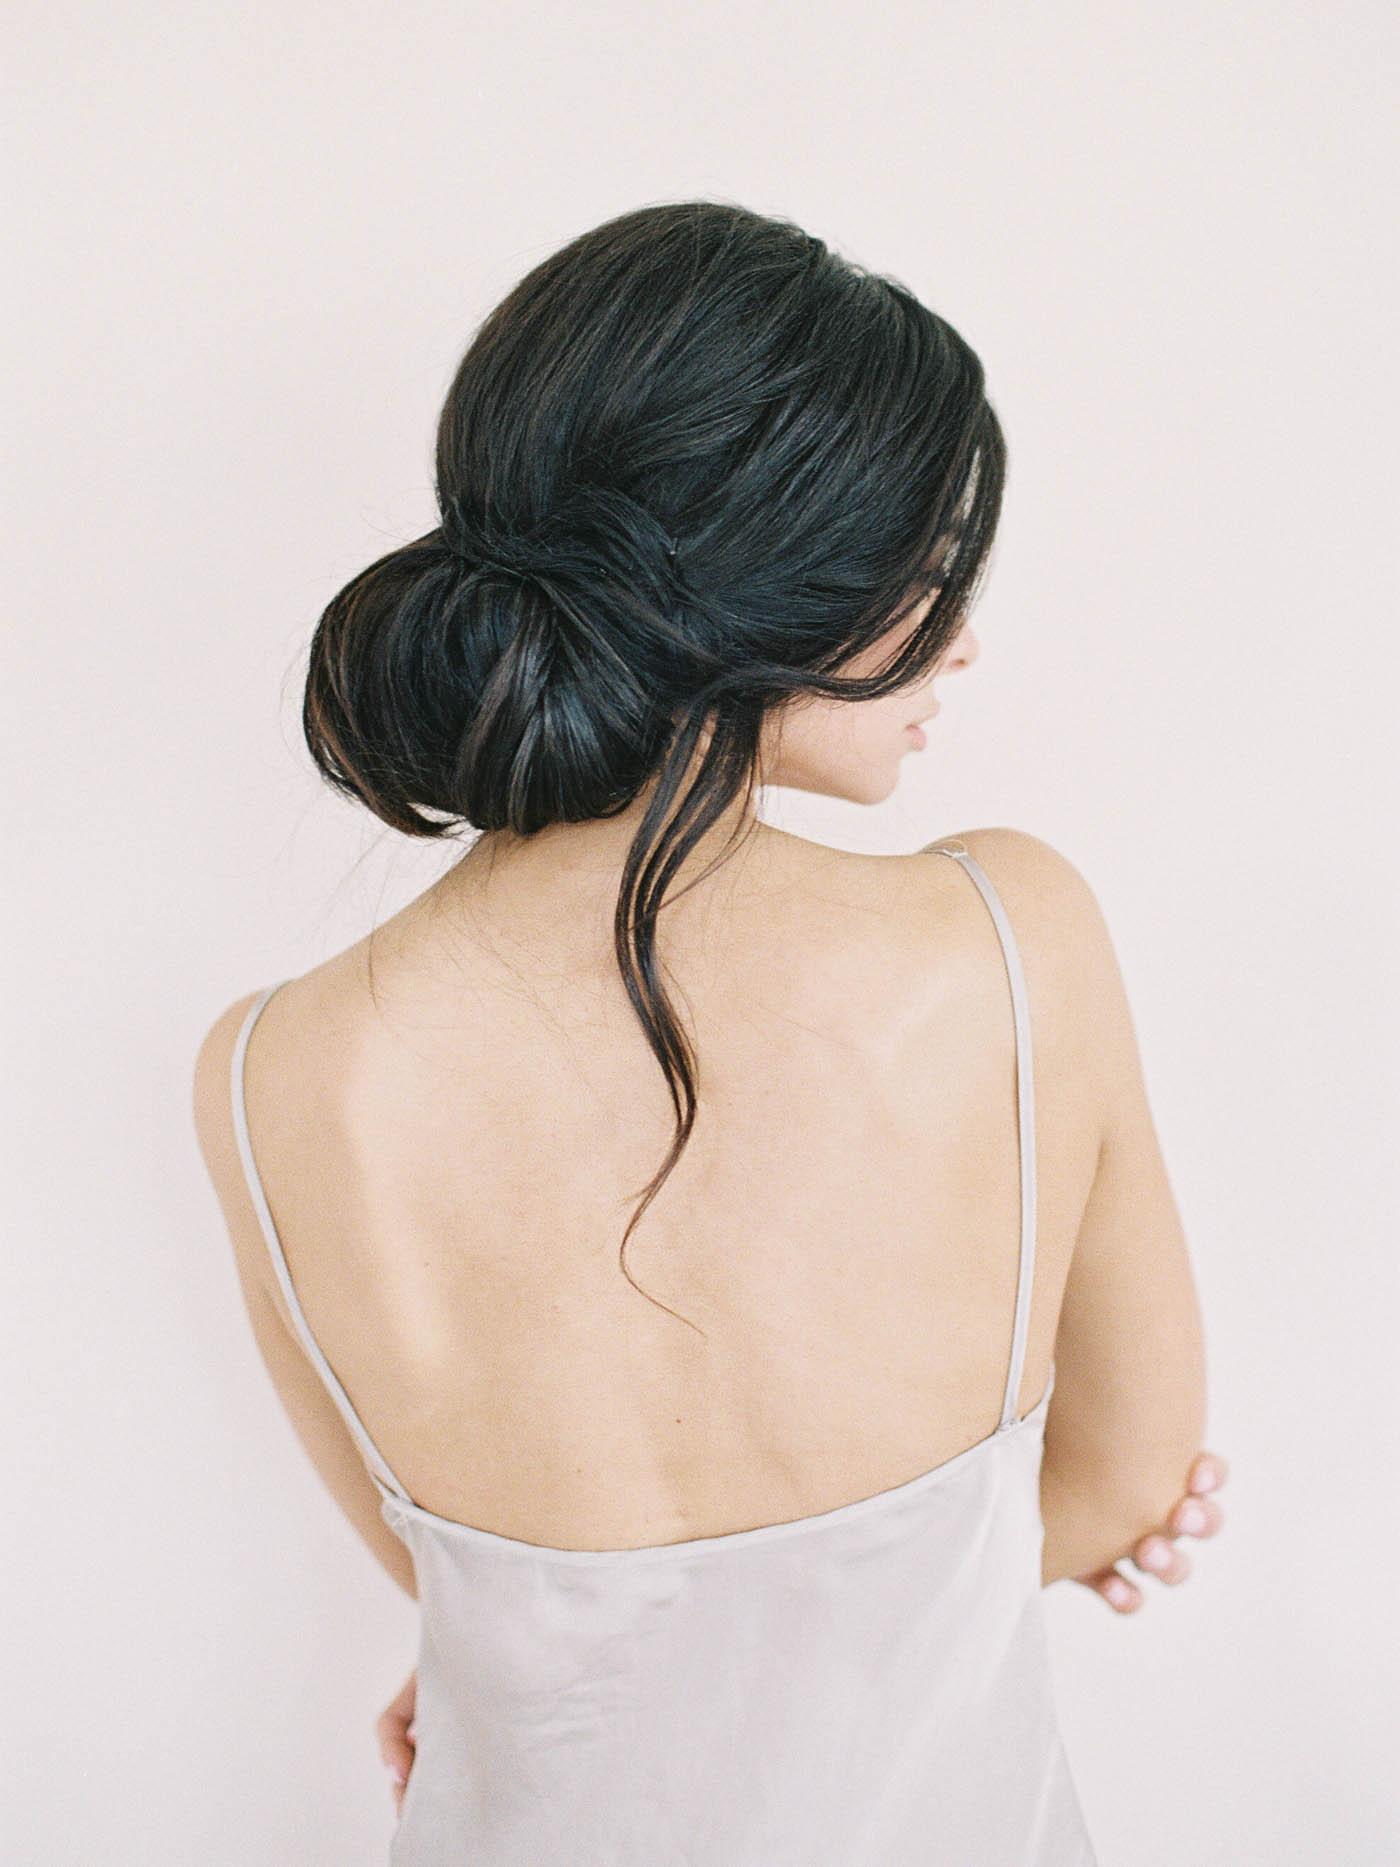 Natural-Engagement-6-Jen_Huang-008122-R1-E019.jpg